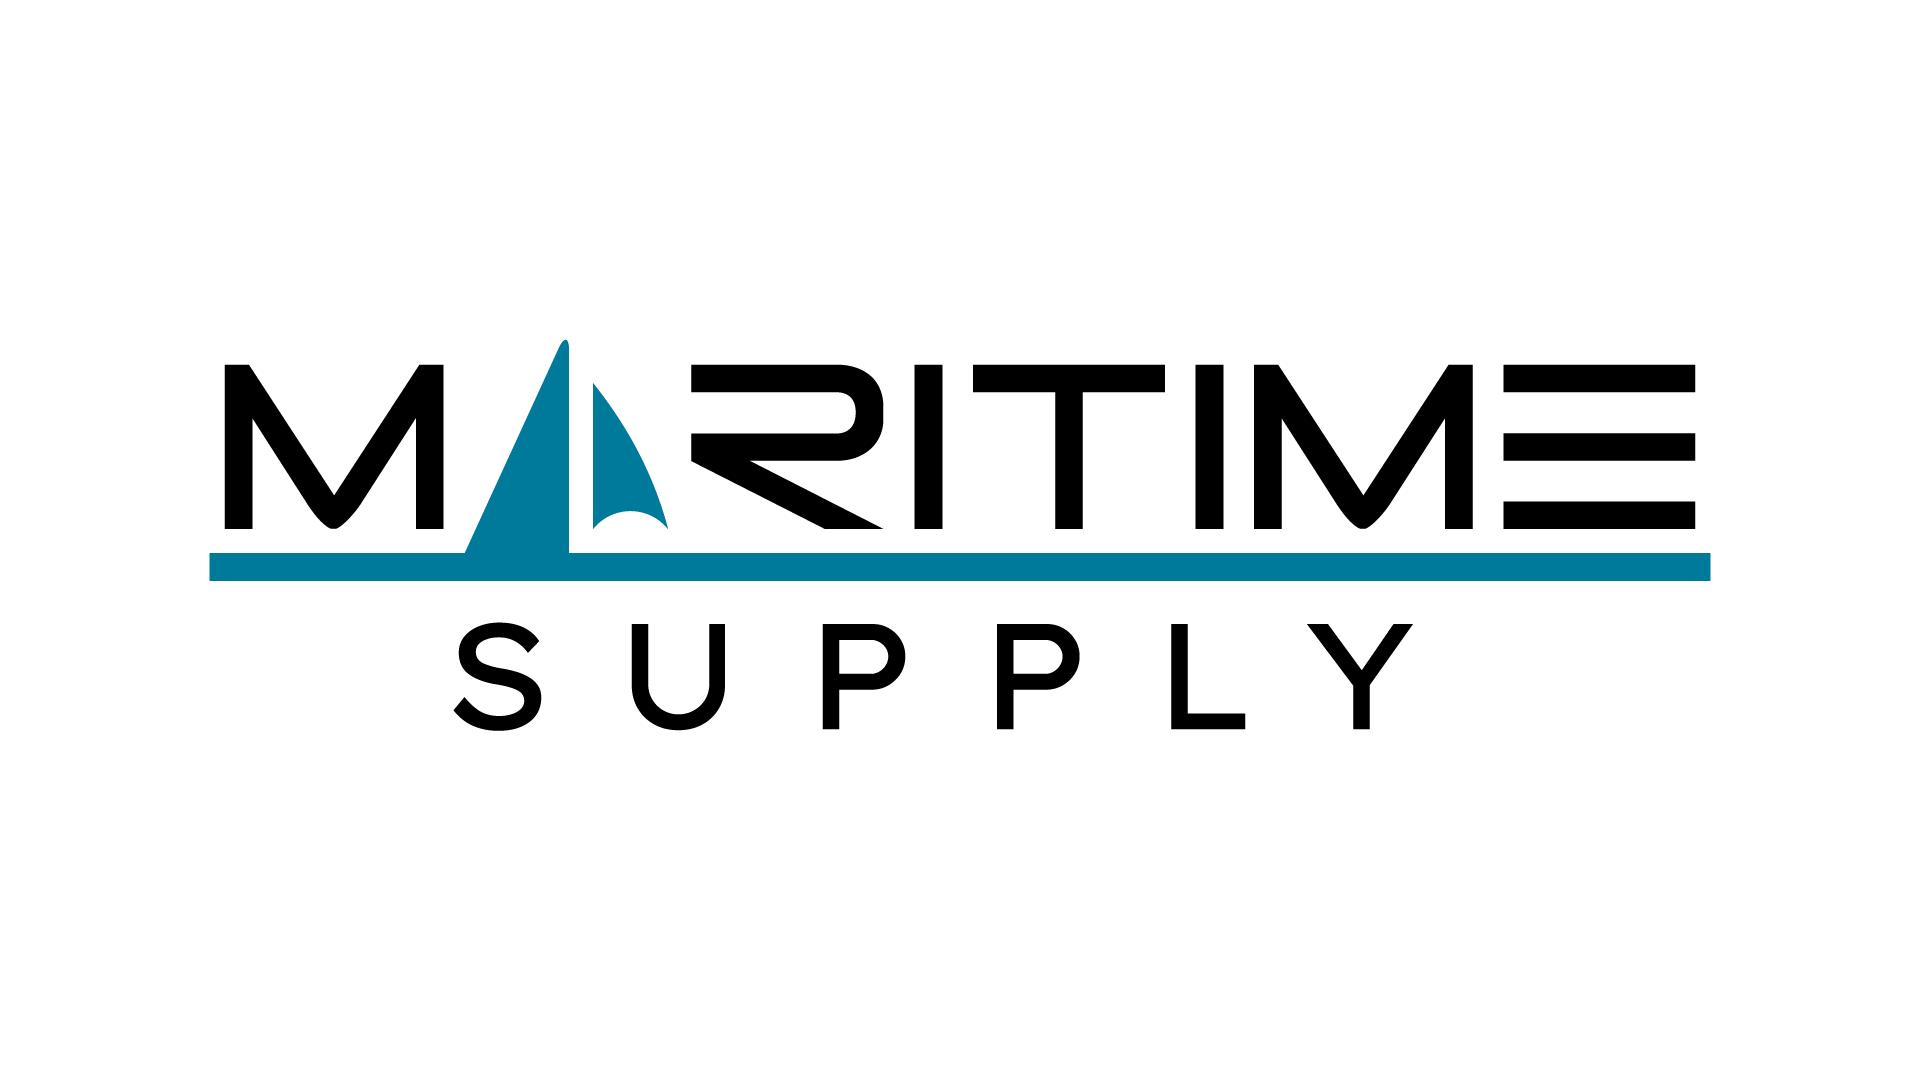 Maritime Supply